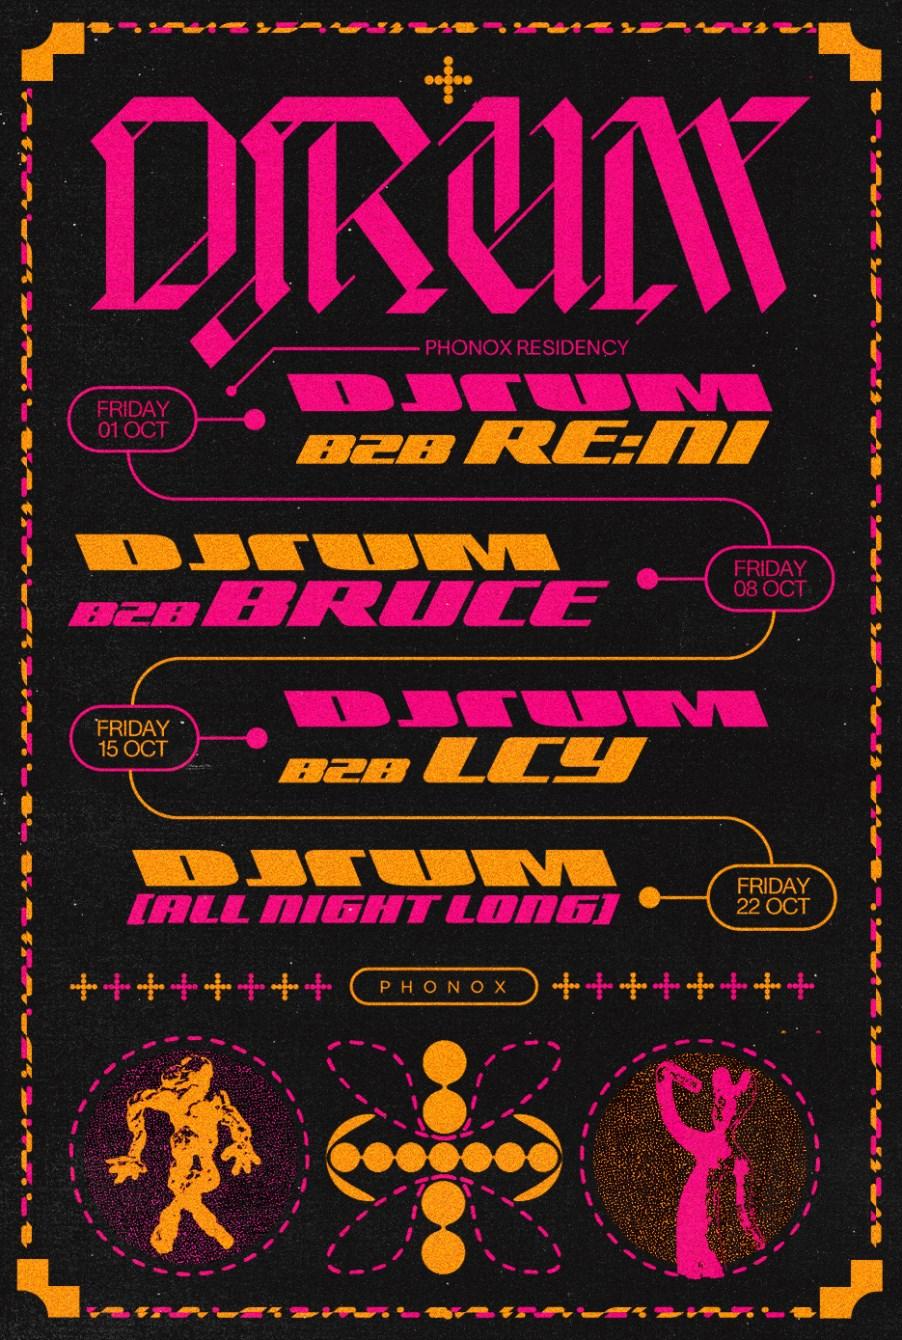 DjRUM [4 Fridays at Phonox] b2b Bruce - Flyer front